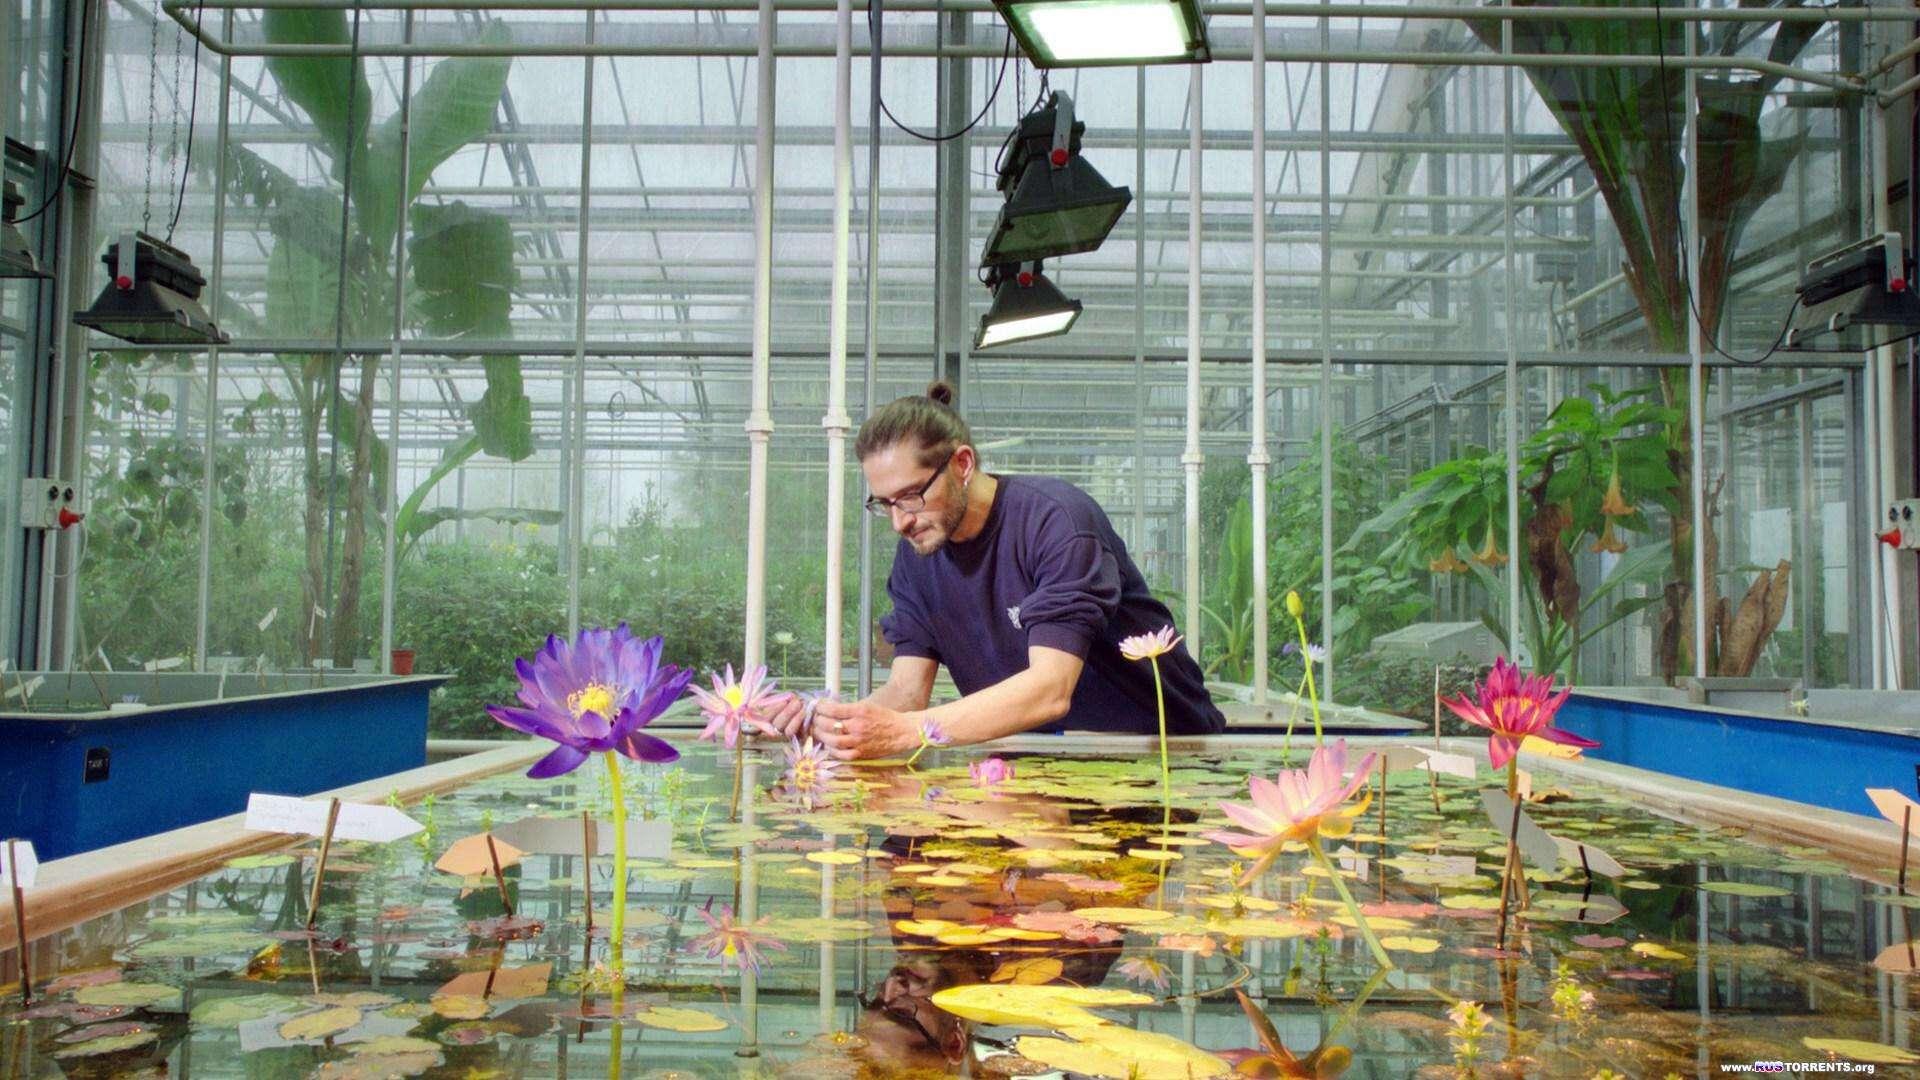 Царство растений [3 из 3] | BDRip 1080p | A